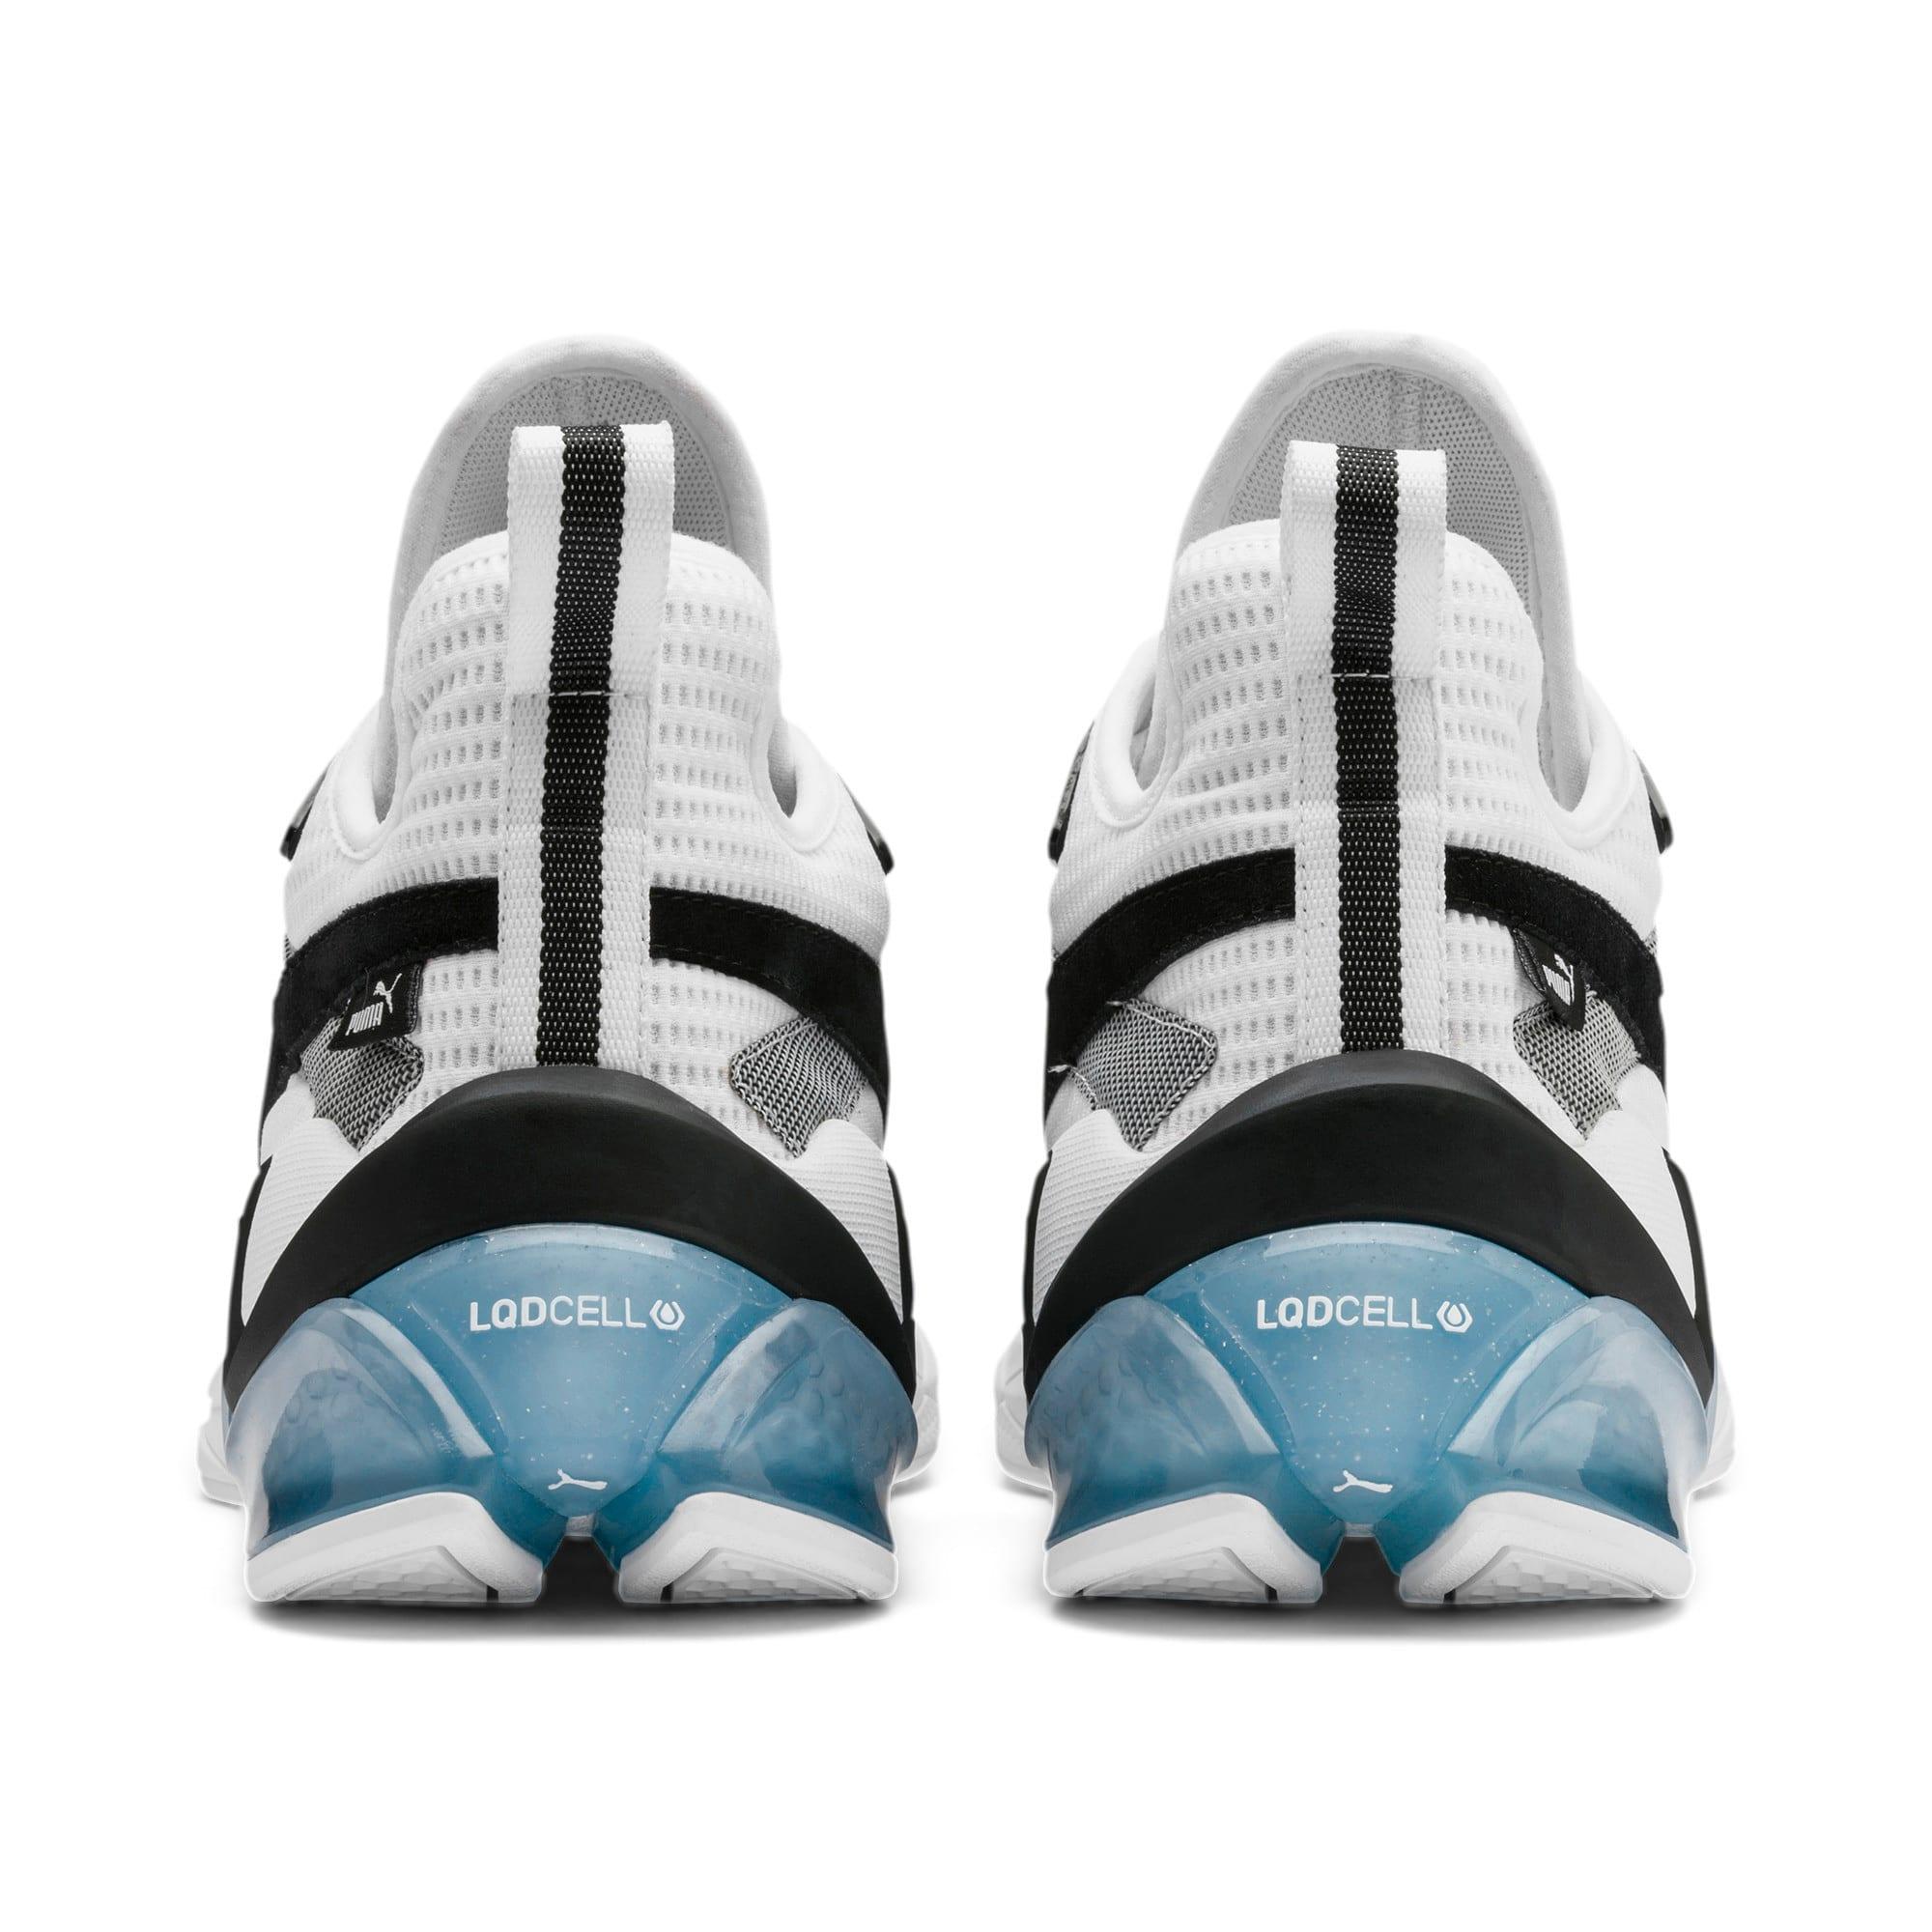 Thumbnail 4 of LQDCELL Origin Herren Sneaker, Puma White-Puma Black, medium